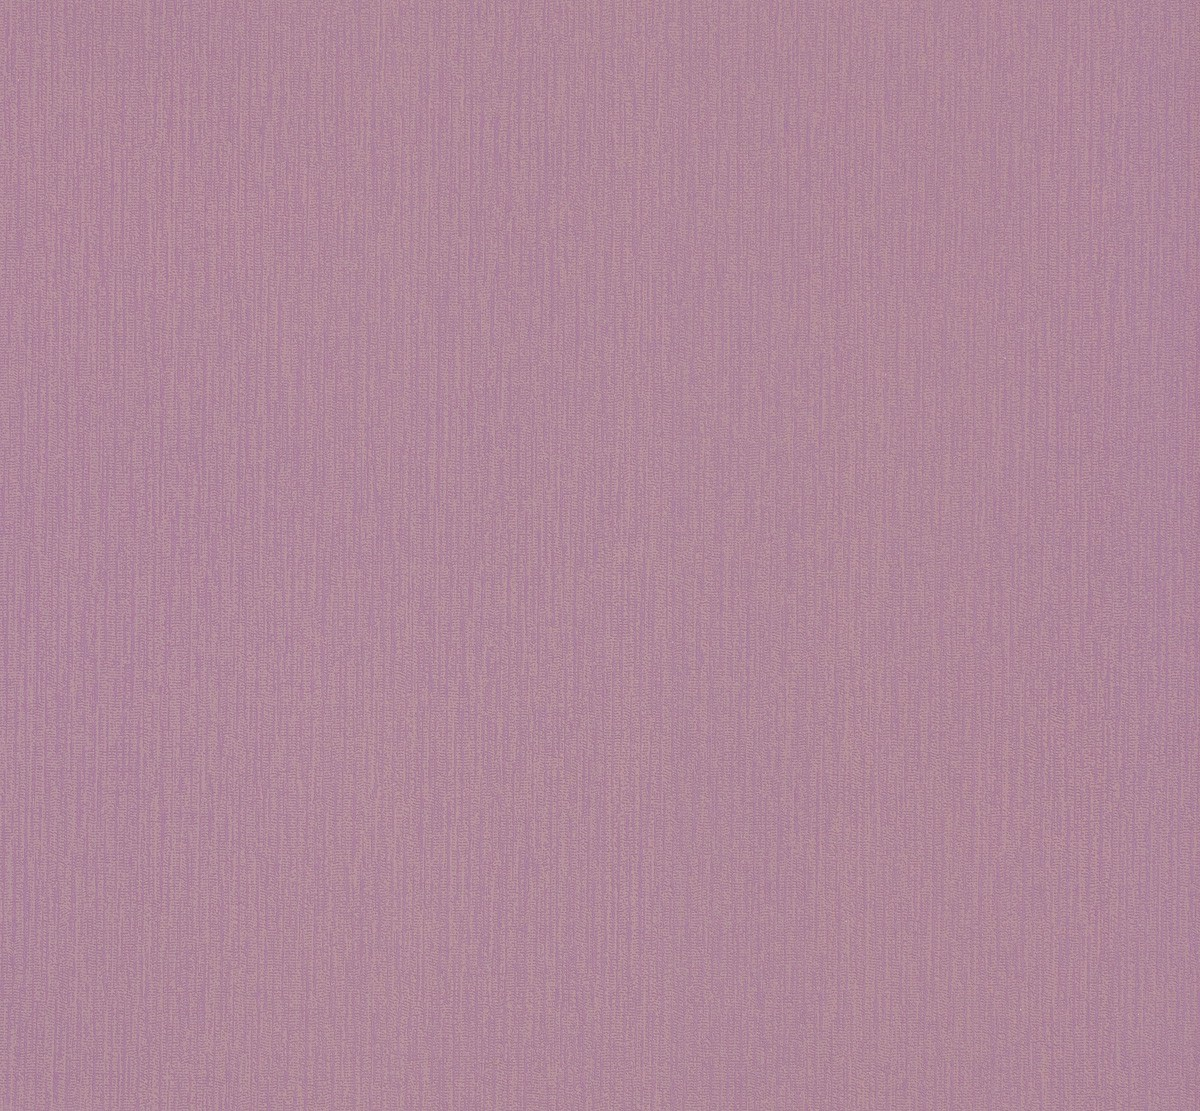 tapete as creation bahamas 3086 65 308665 uni struktur lila. Black Bedroom Furniture Sets. Home Design Ideas